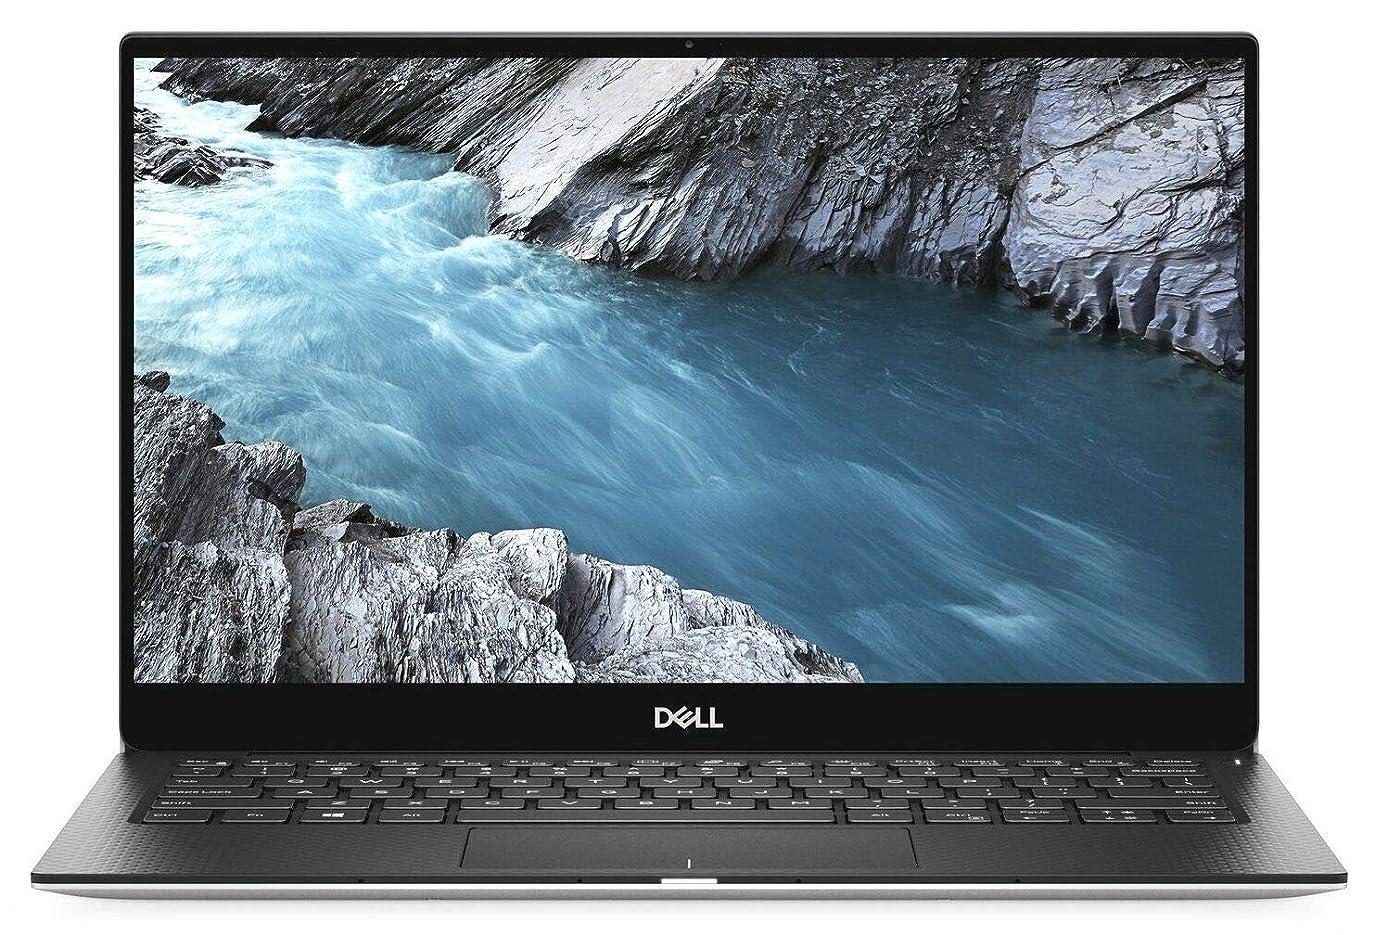 Dell XPS 9380 Laptop, 13.3